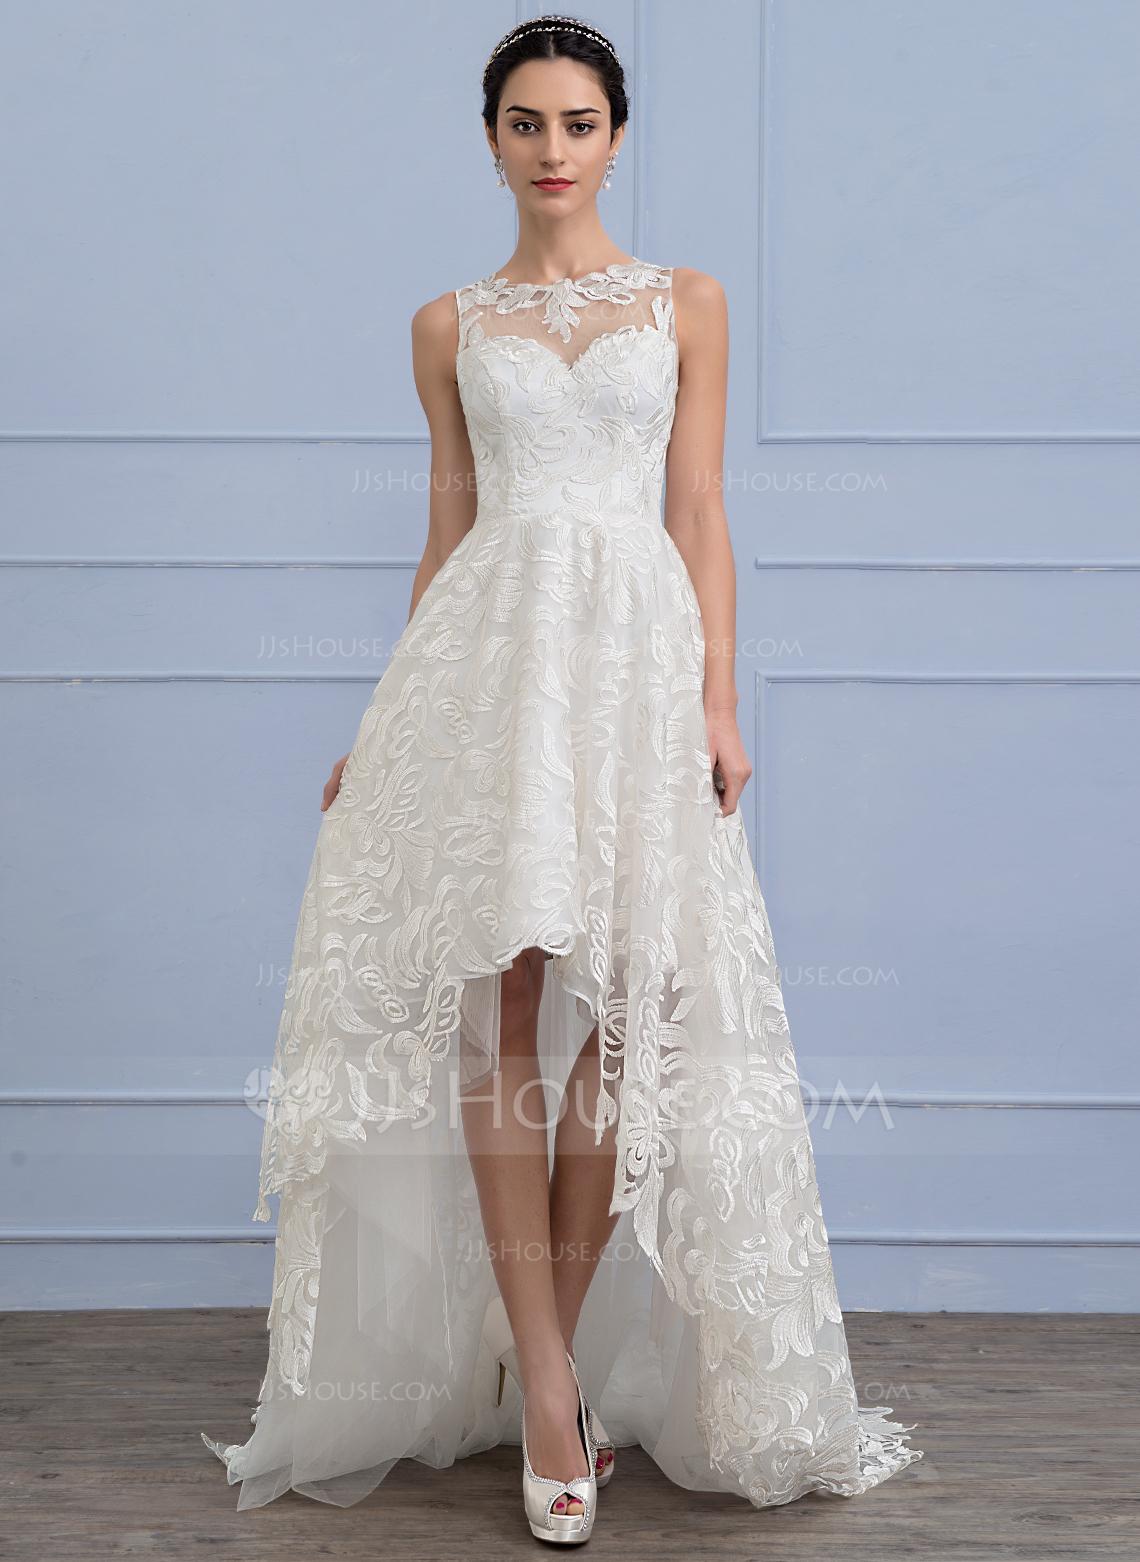 asymmetrical wedding dresses photo - 1